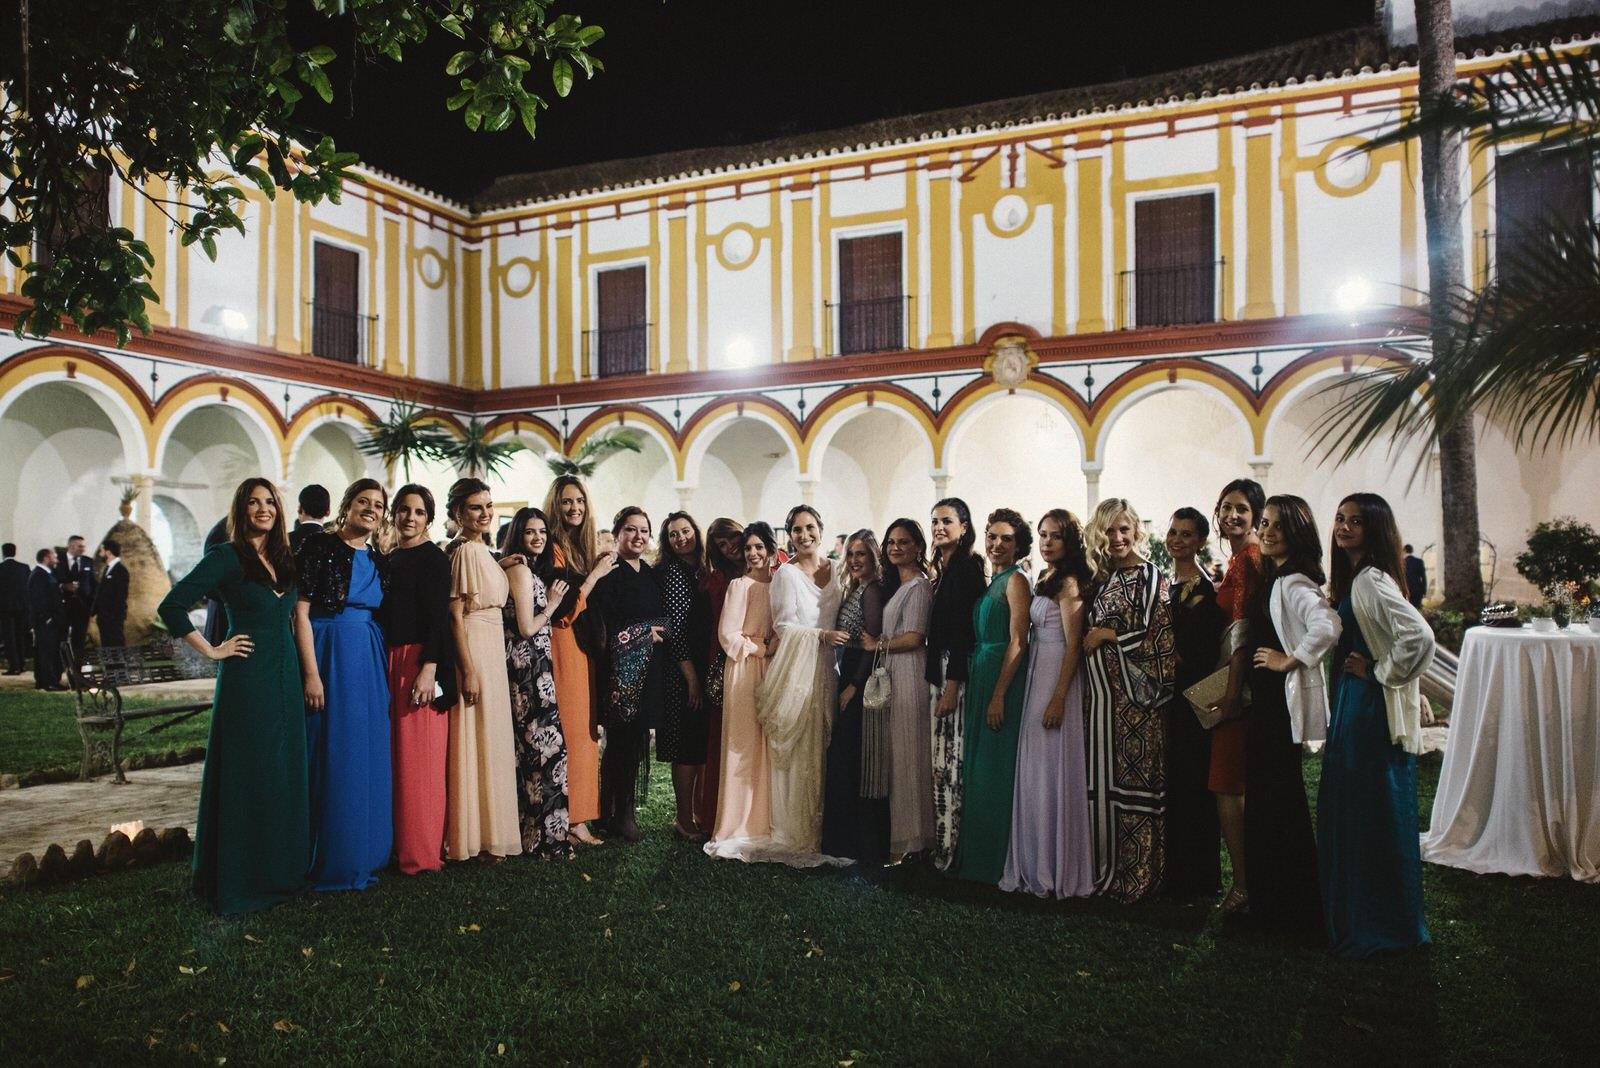 fotografo de bodas sevilla - fotografo boda - fotografía sevilla - Andrés AmarilloAAA_3439- fine.JPG